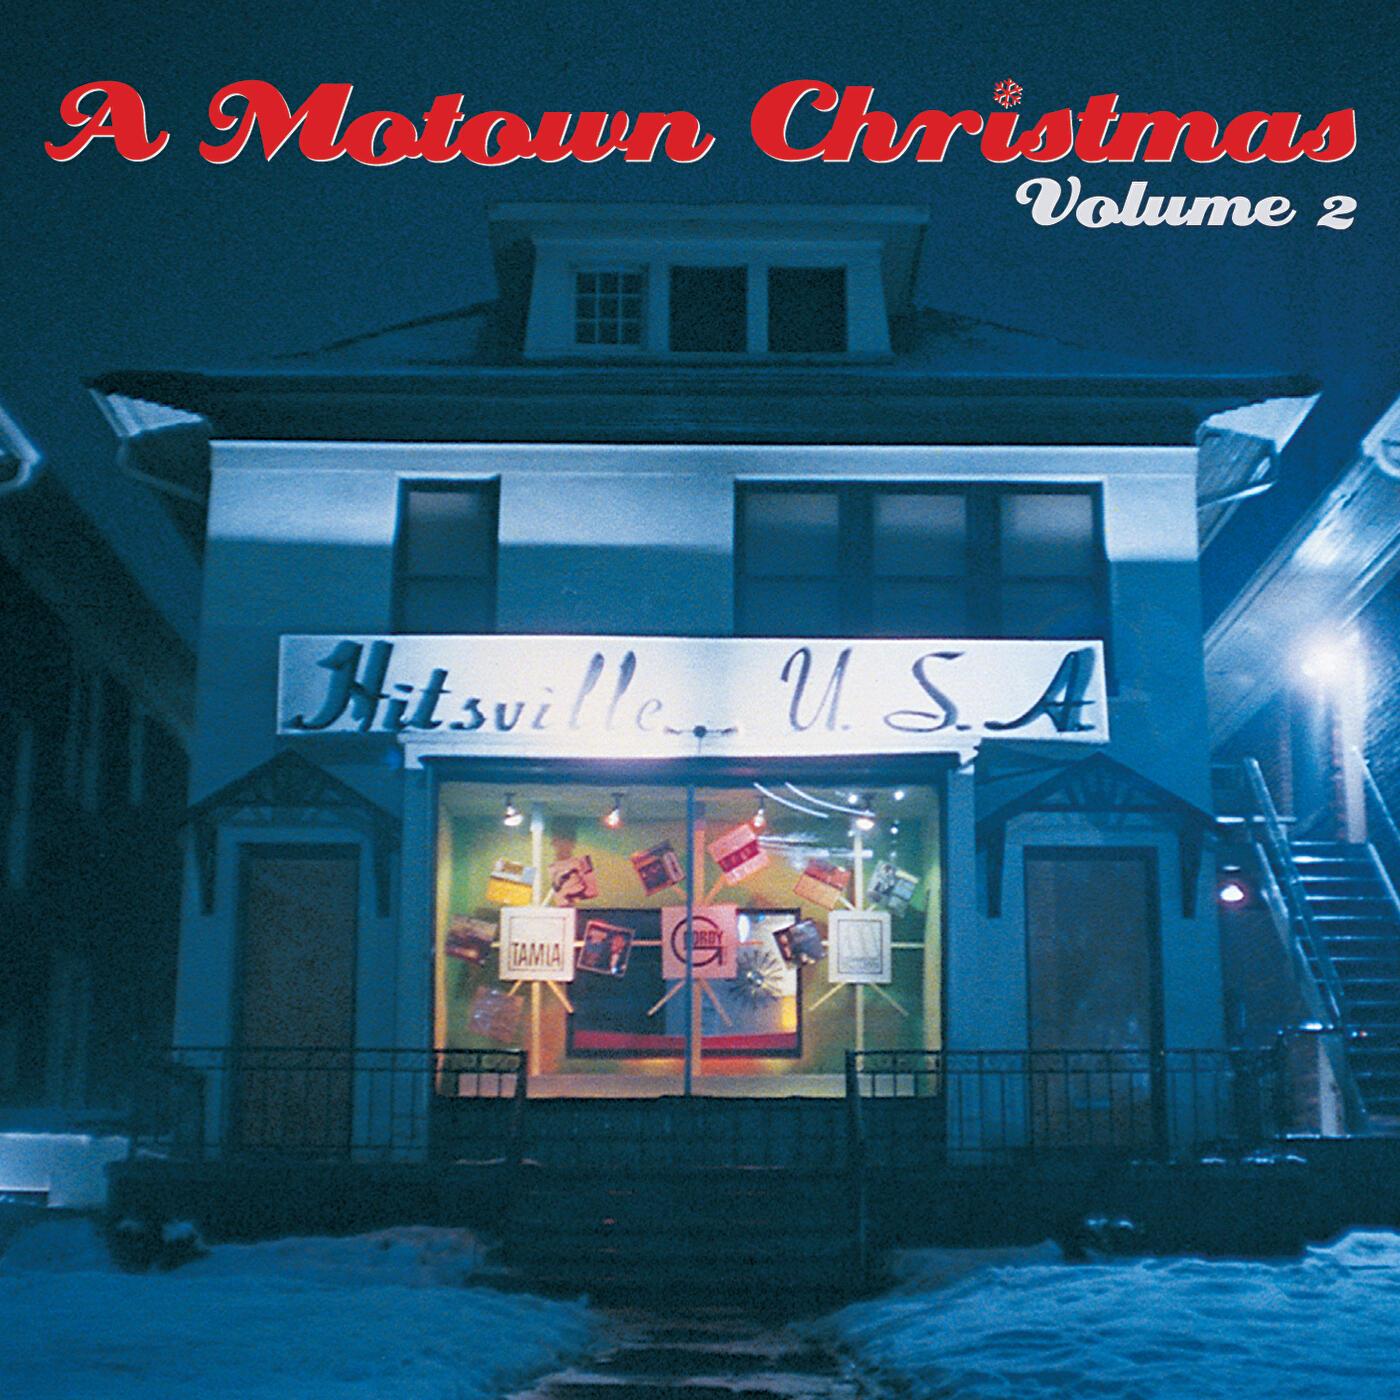 Listen Free to Various Artists - A Motown Christmas Radio on iHeartRadio | iHeartRadio